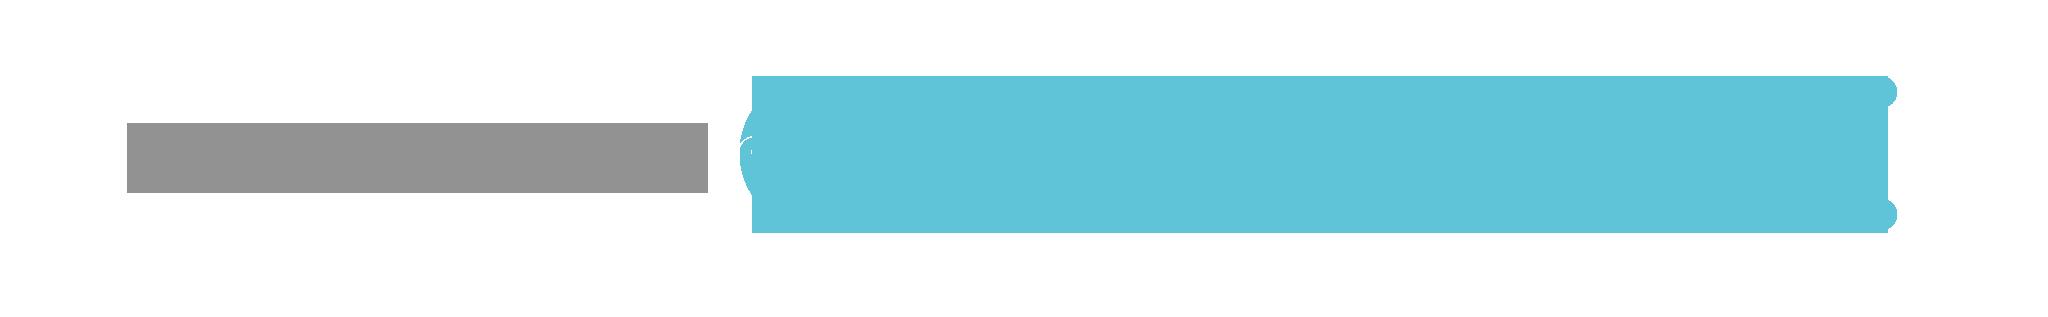 RC logo blue.png